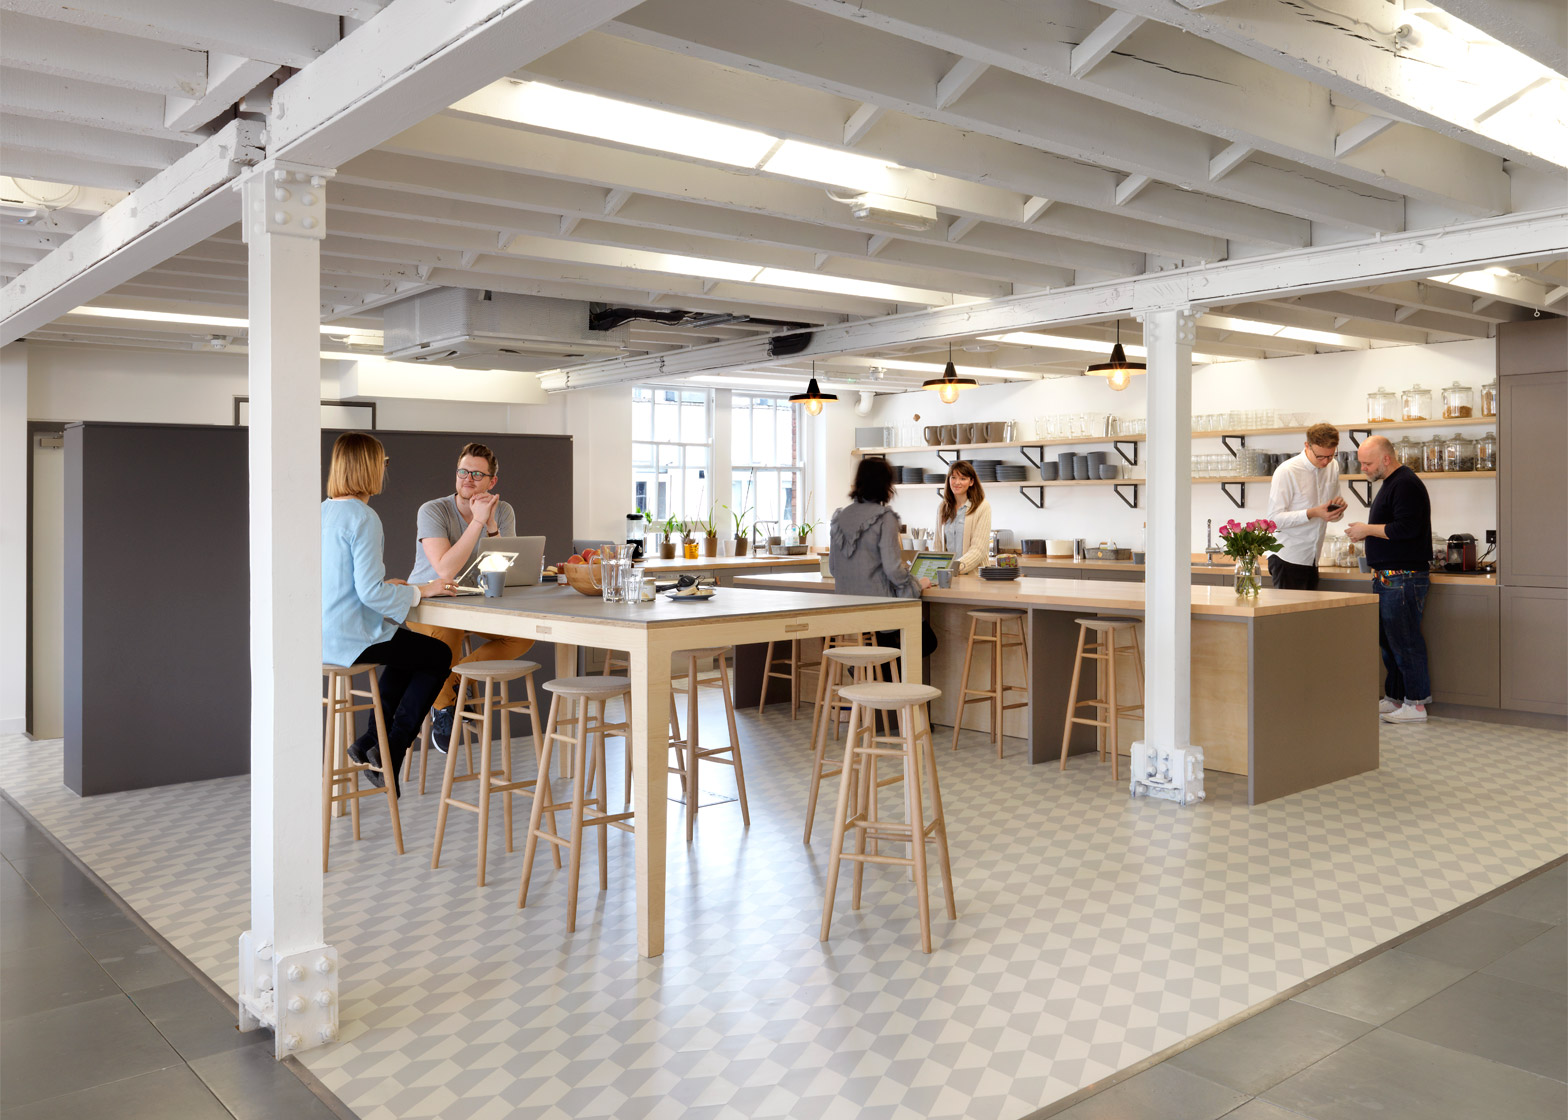 airbnb-office_london_threefold_dezeen_1568_2